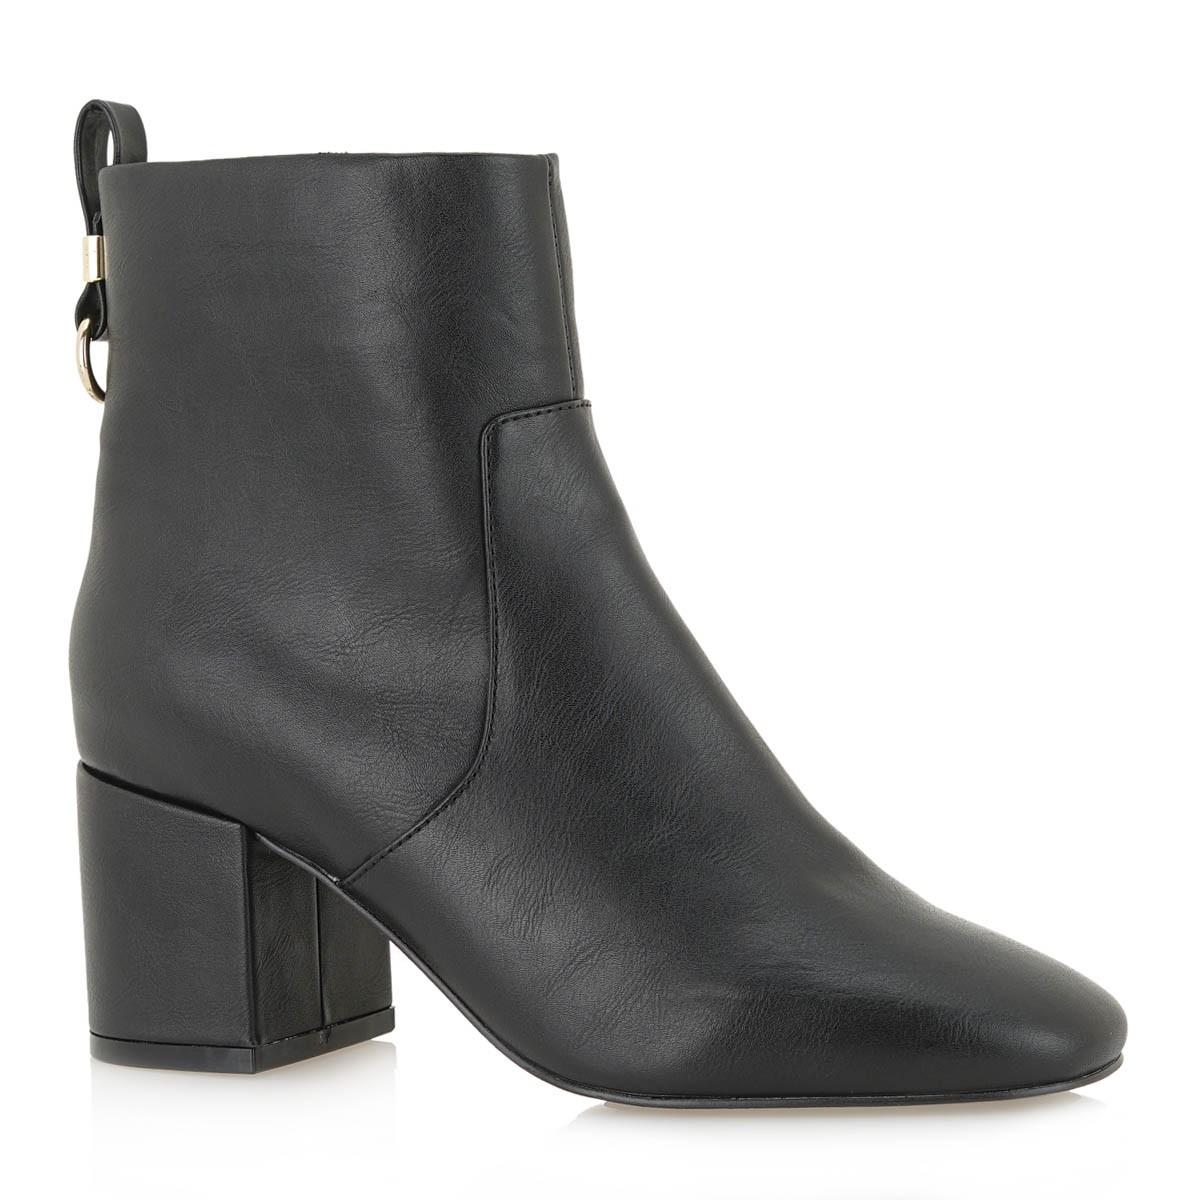 Exe Shoes Γυναικεία Μποτάκια CHERRY-539 Μαύρο J37005393001